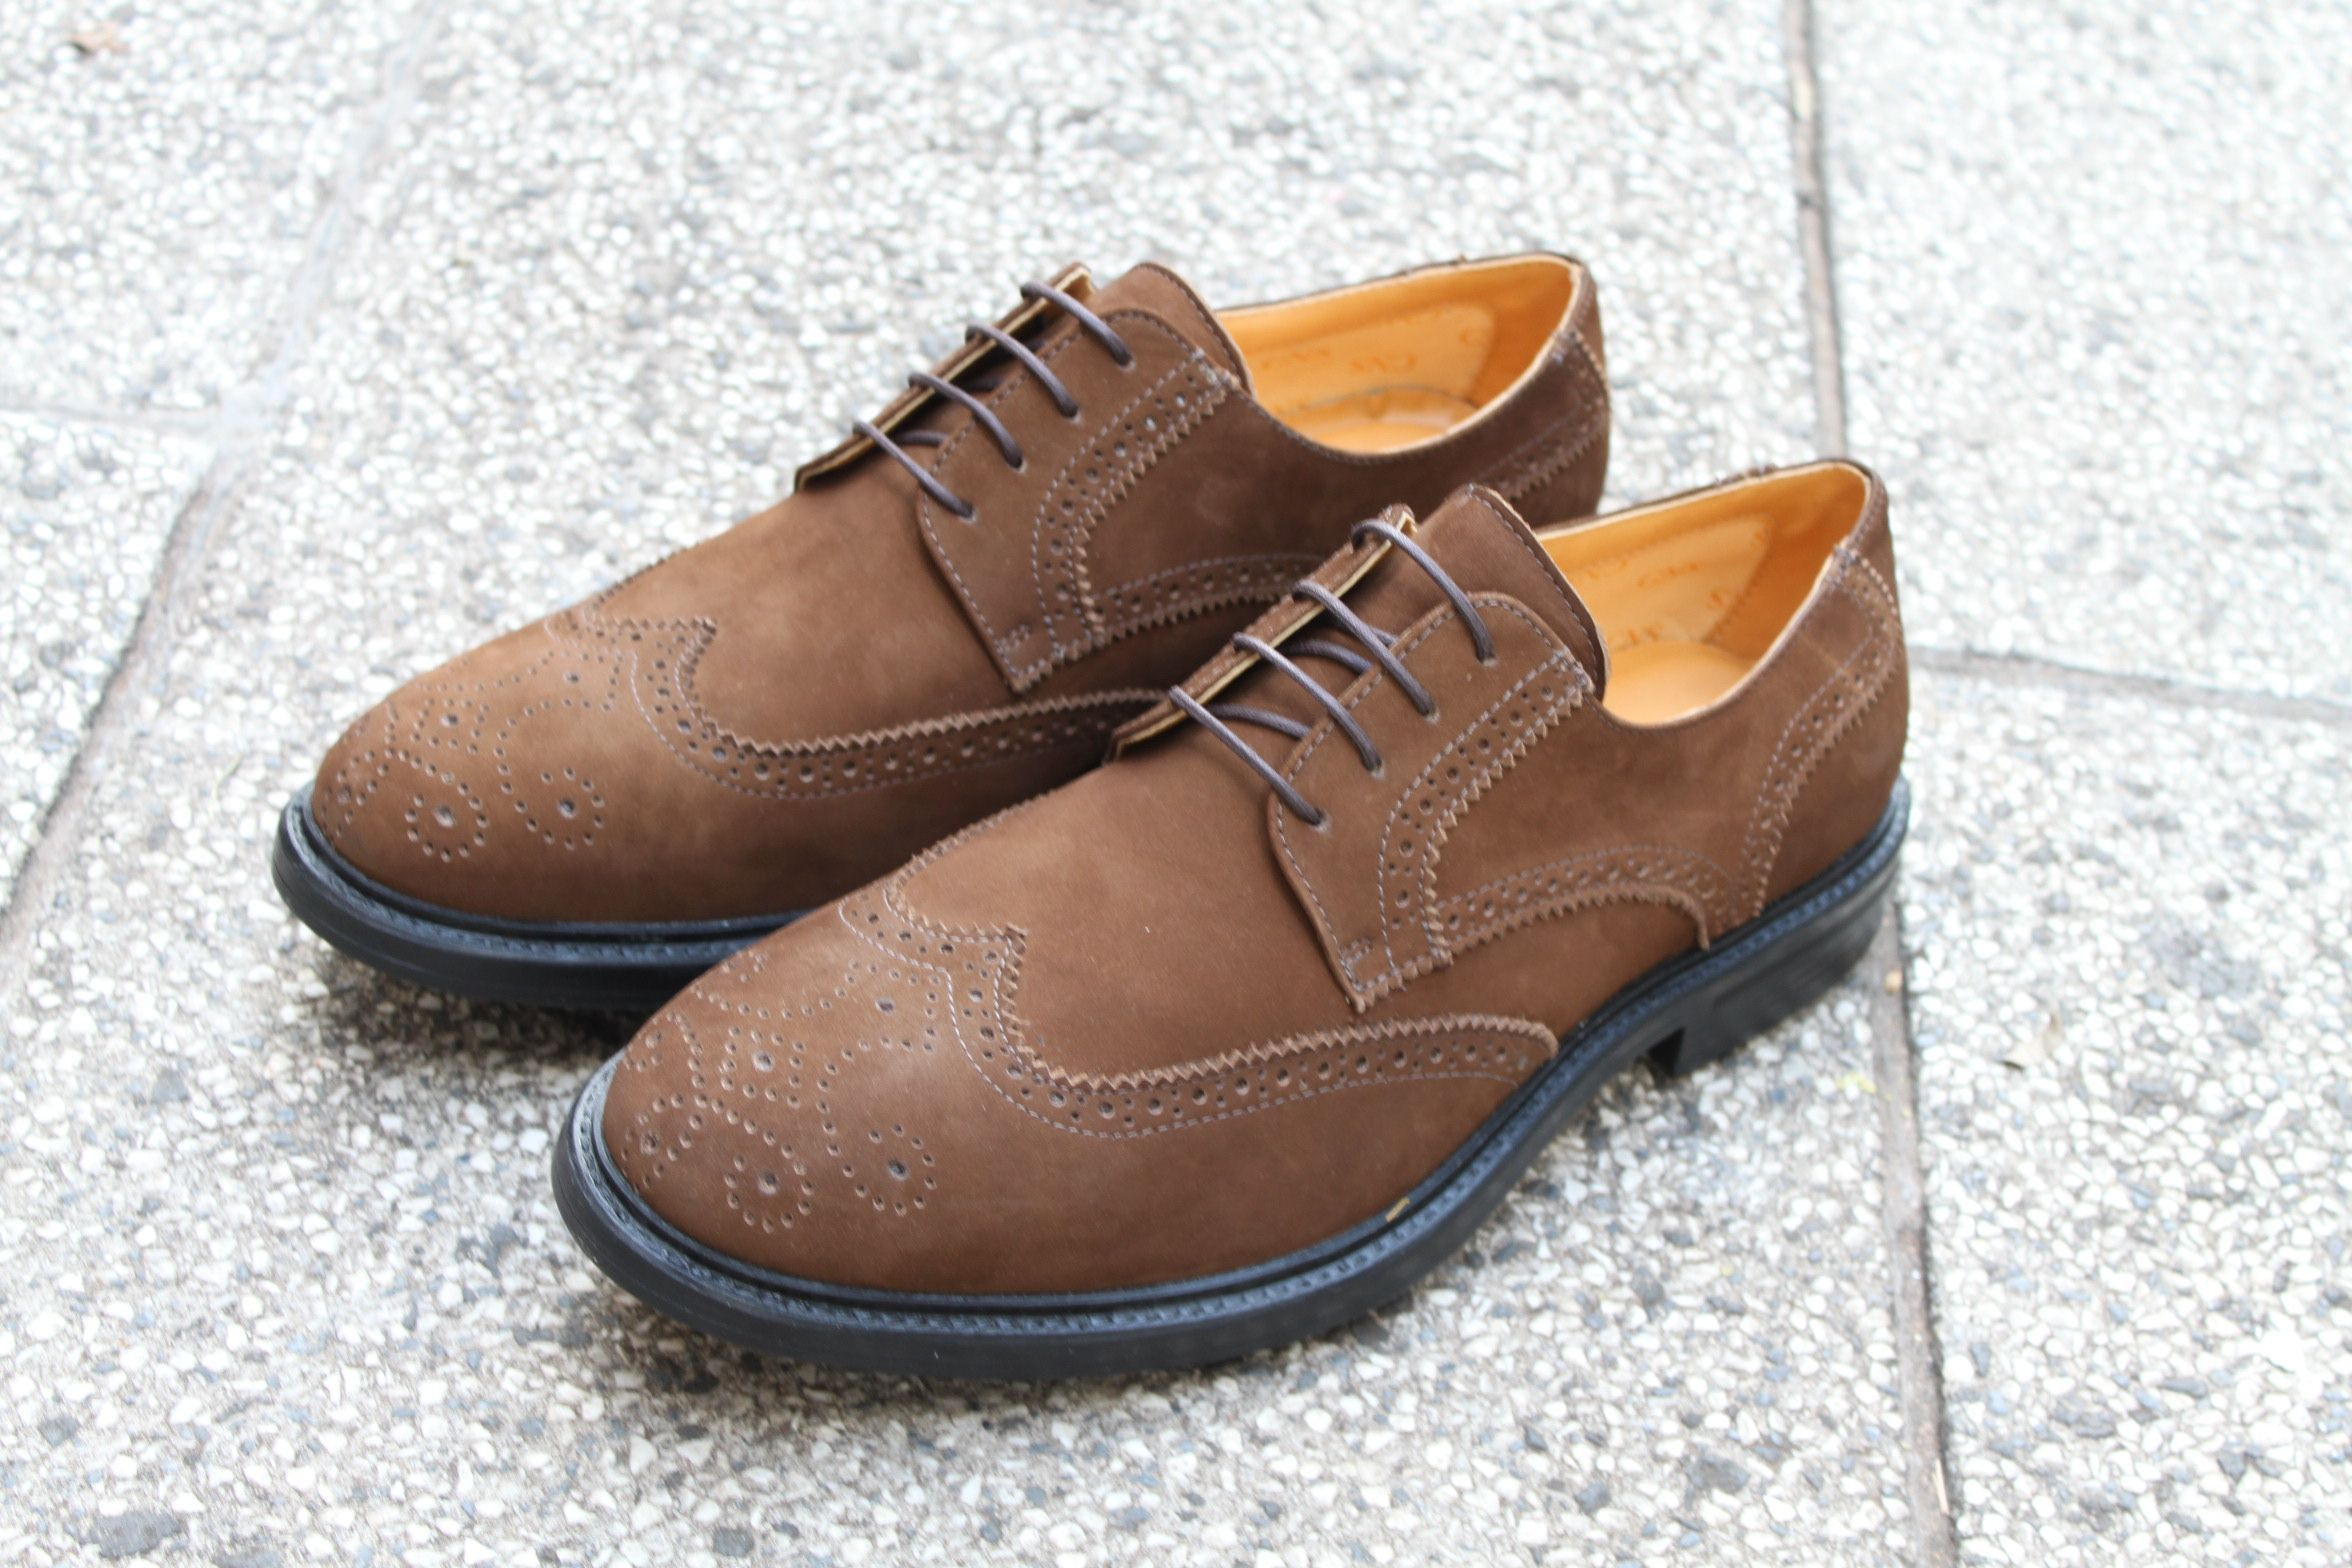 c041dab74 Sapato Casual Masculino Derby CNS Frank em Couro Camurça cor Rato e Sola de  Borracha.